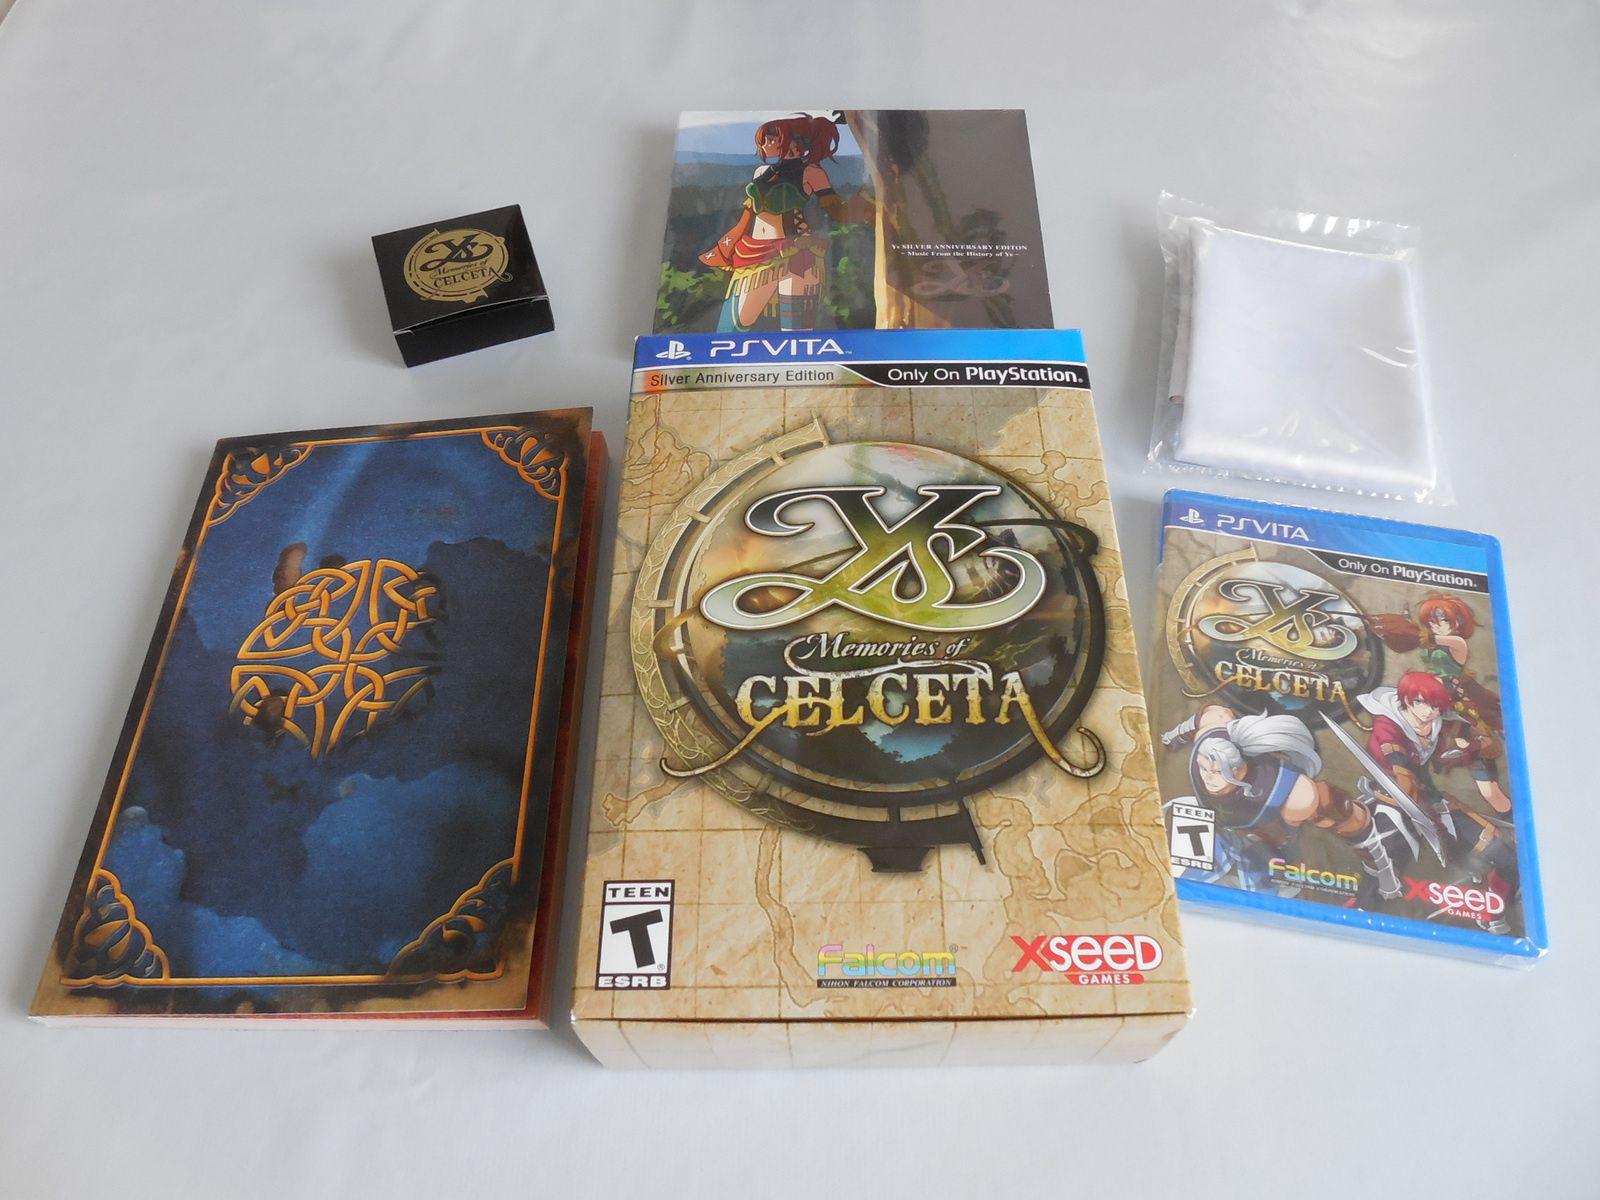 [Collection] PS Vita Ys - Memories of Celceta - Silver Anniversary Edition